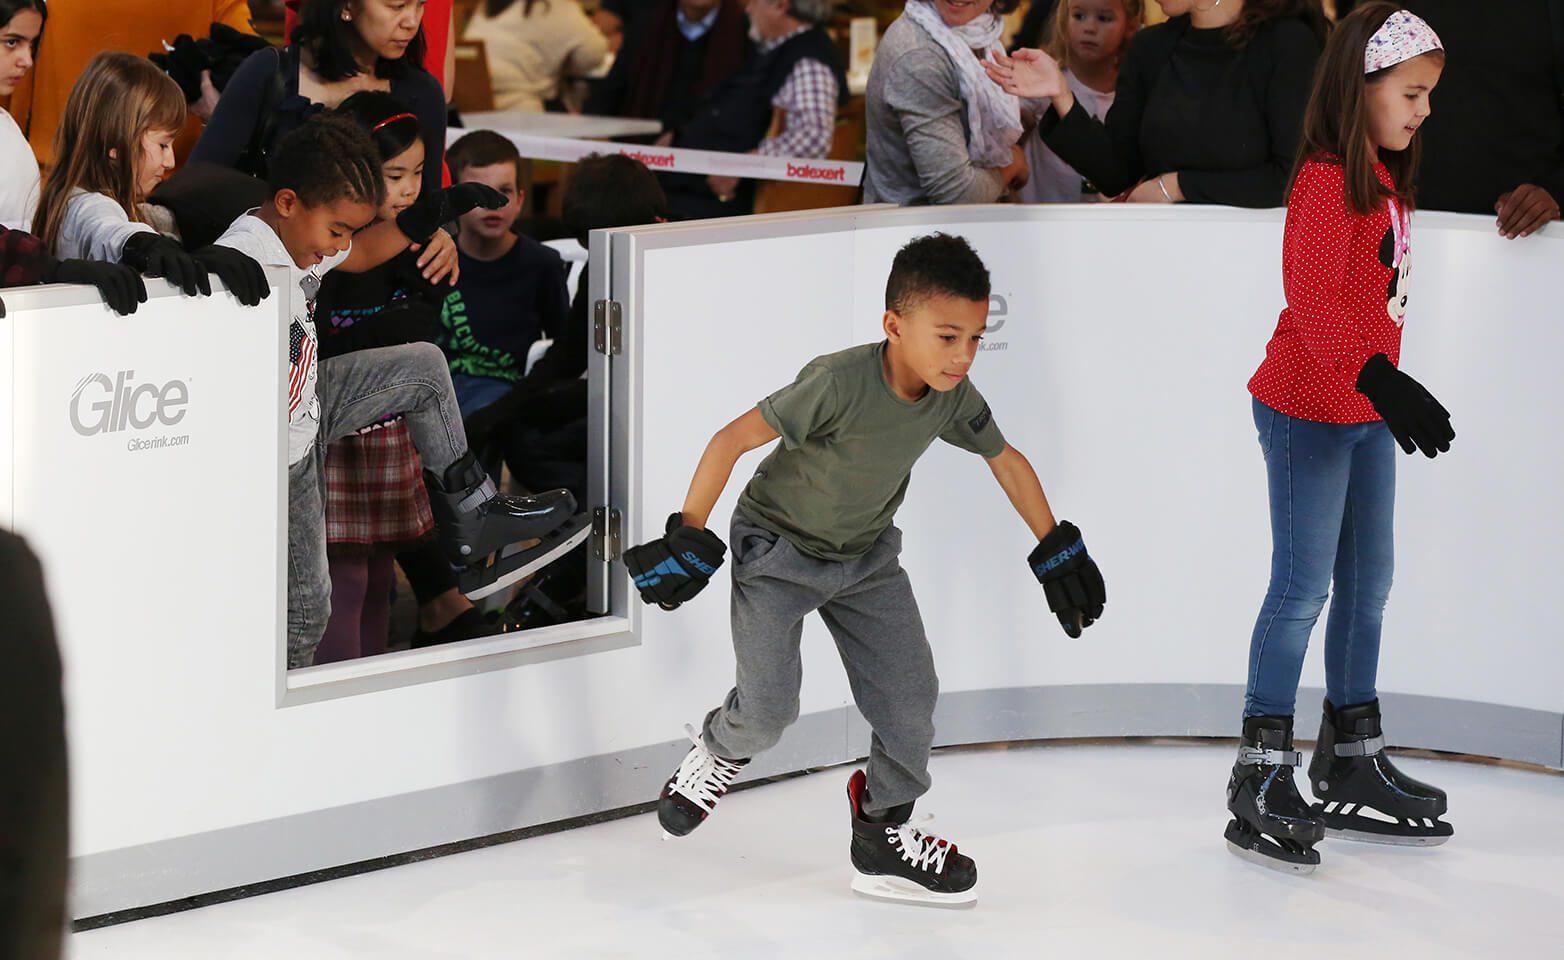 crowds-at-plastic-ice-rink